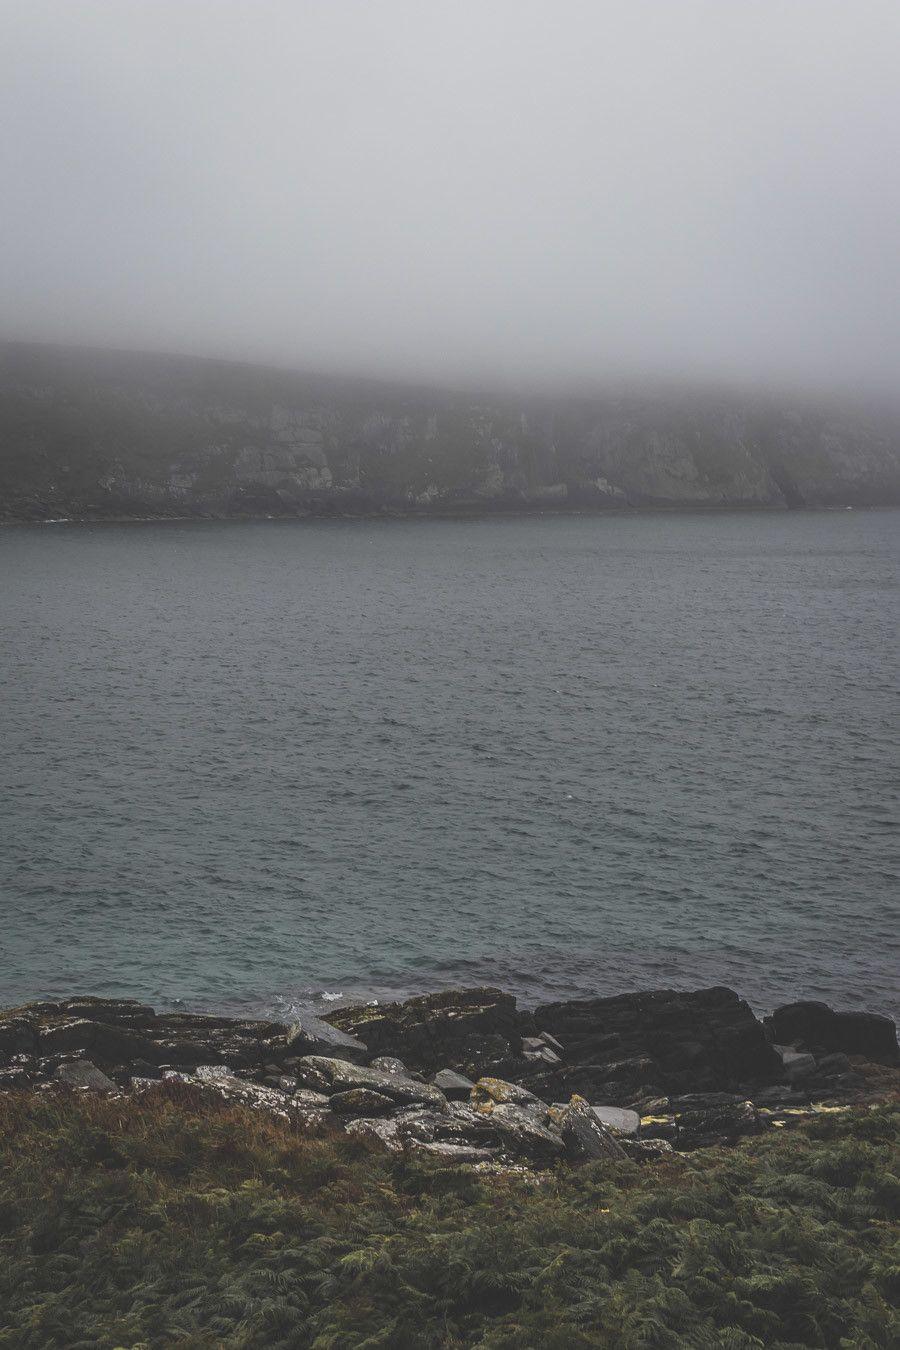 Le brouillard irlandais